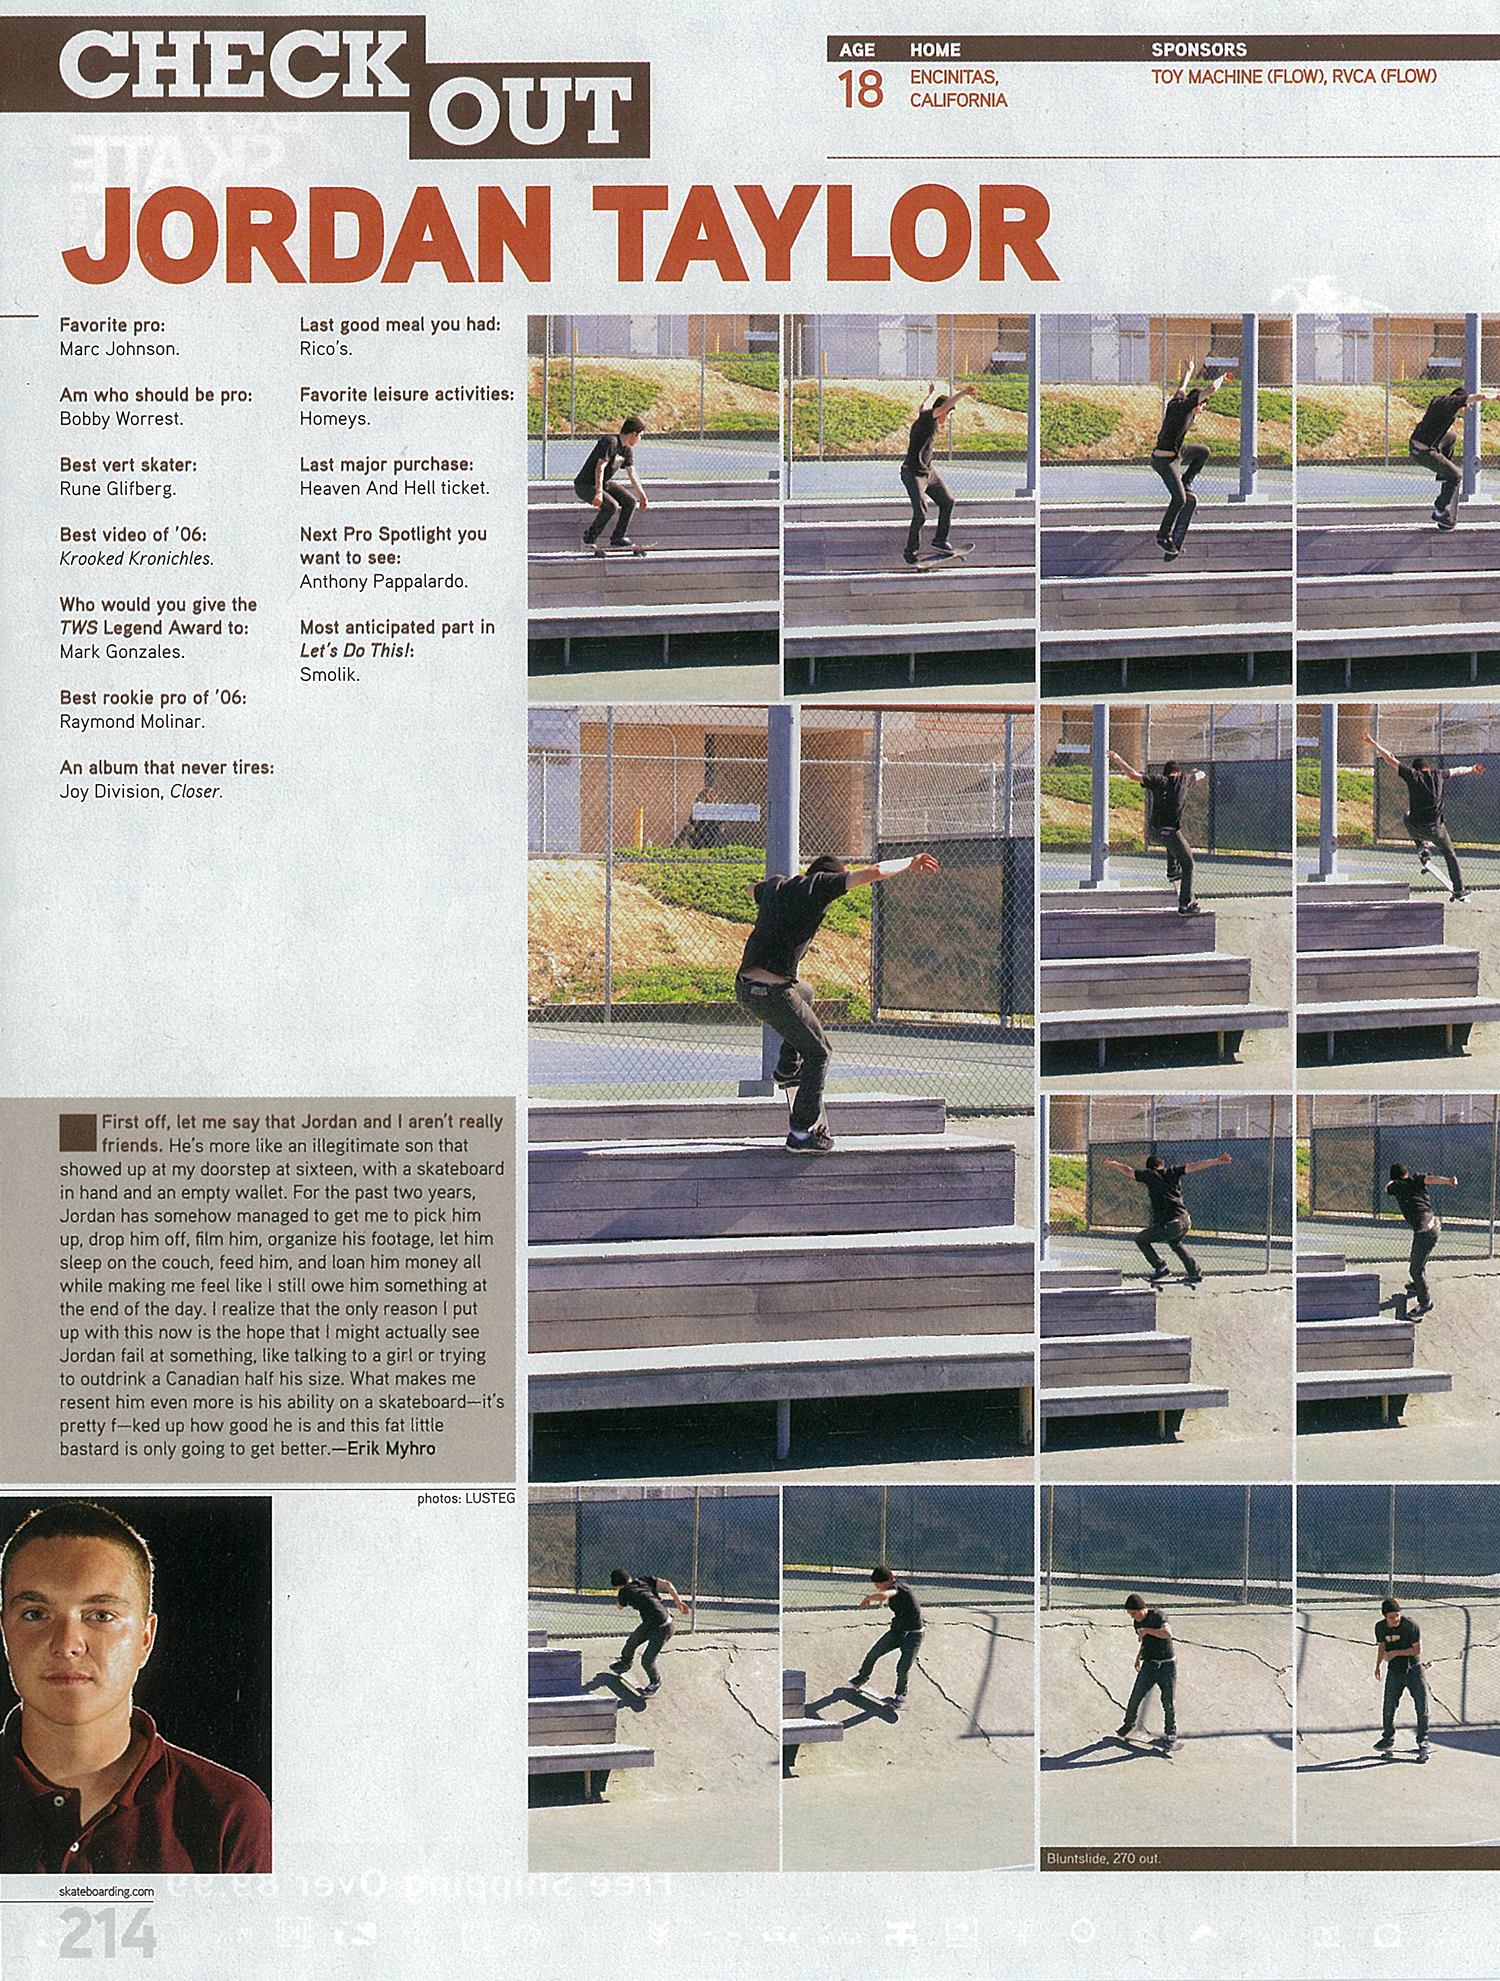 21_jordan_taylor_check_out_tws.jpg